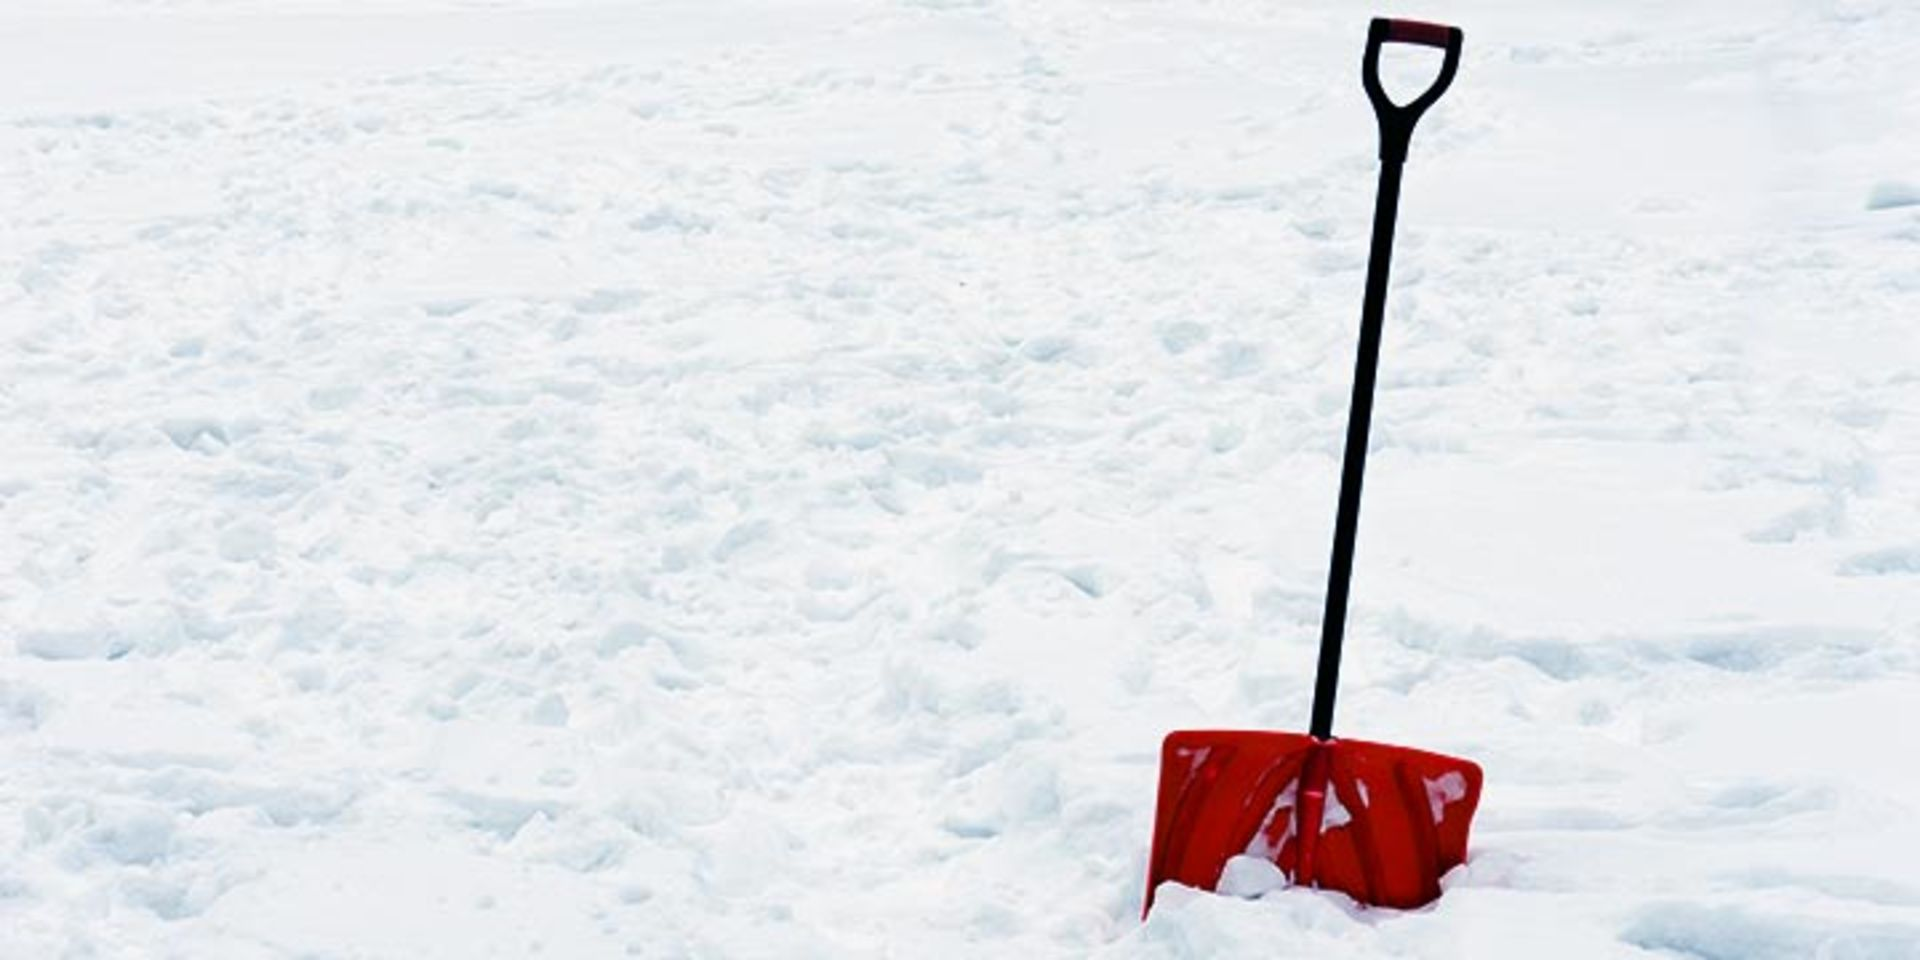 3 Brilliant Hacks to Make Snow Shoveling Less Miserable